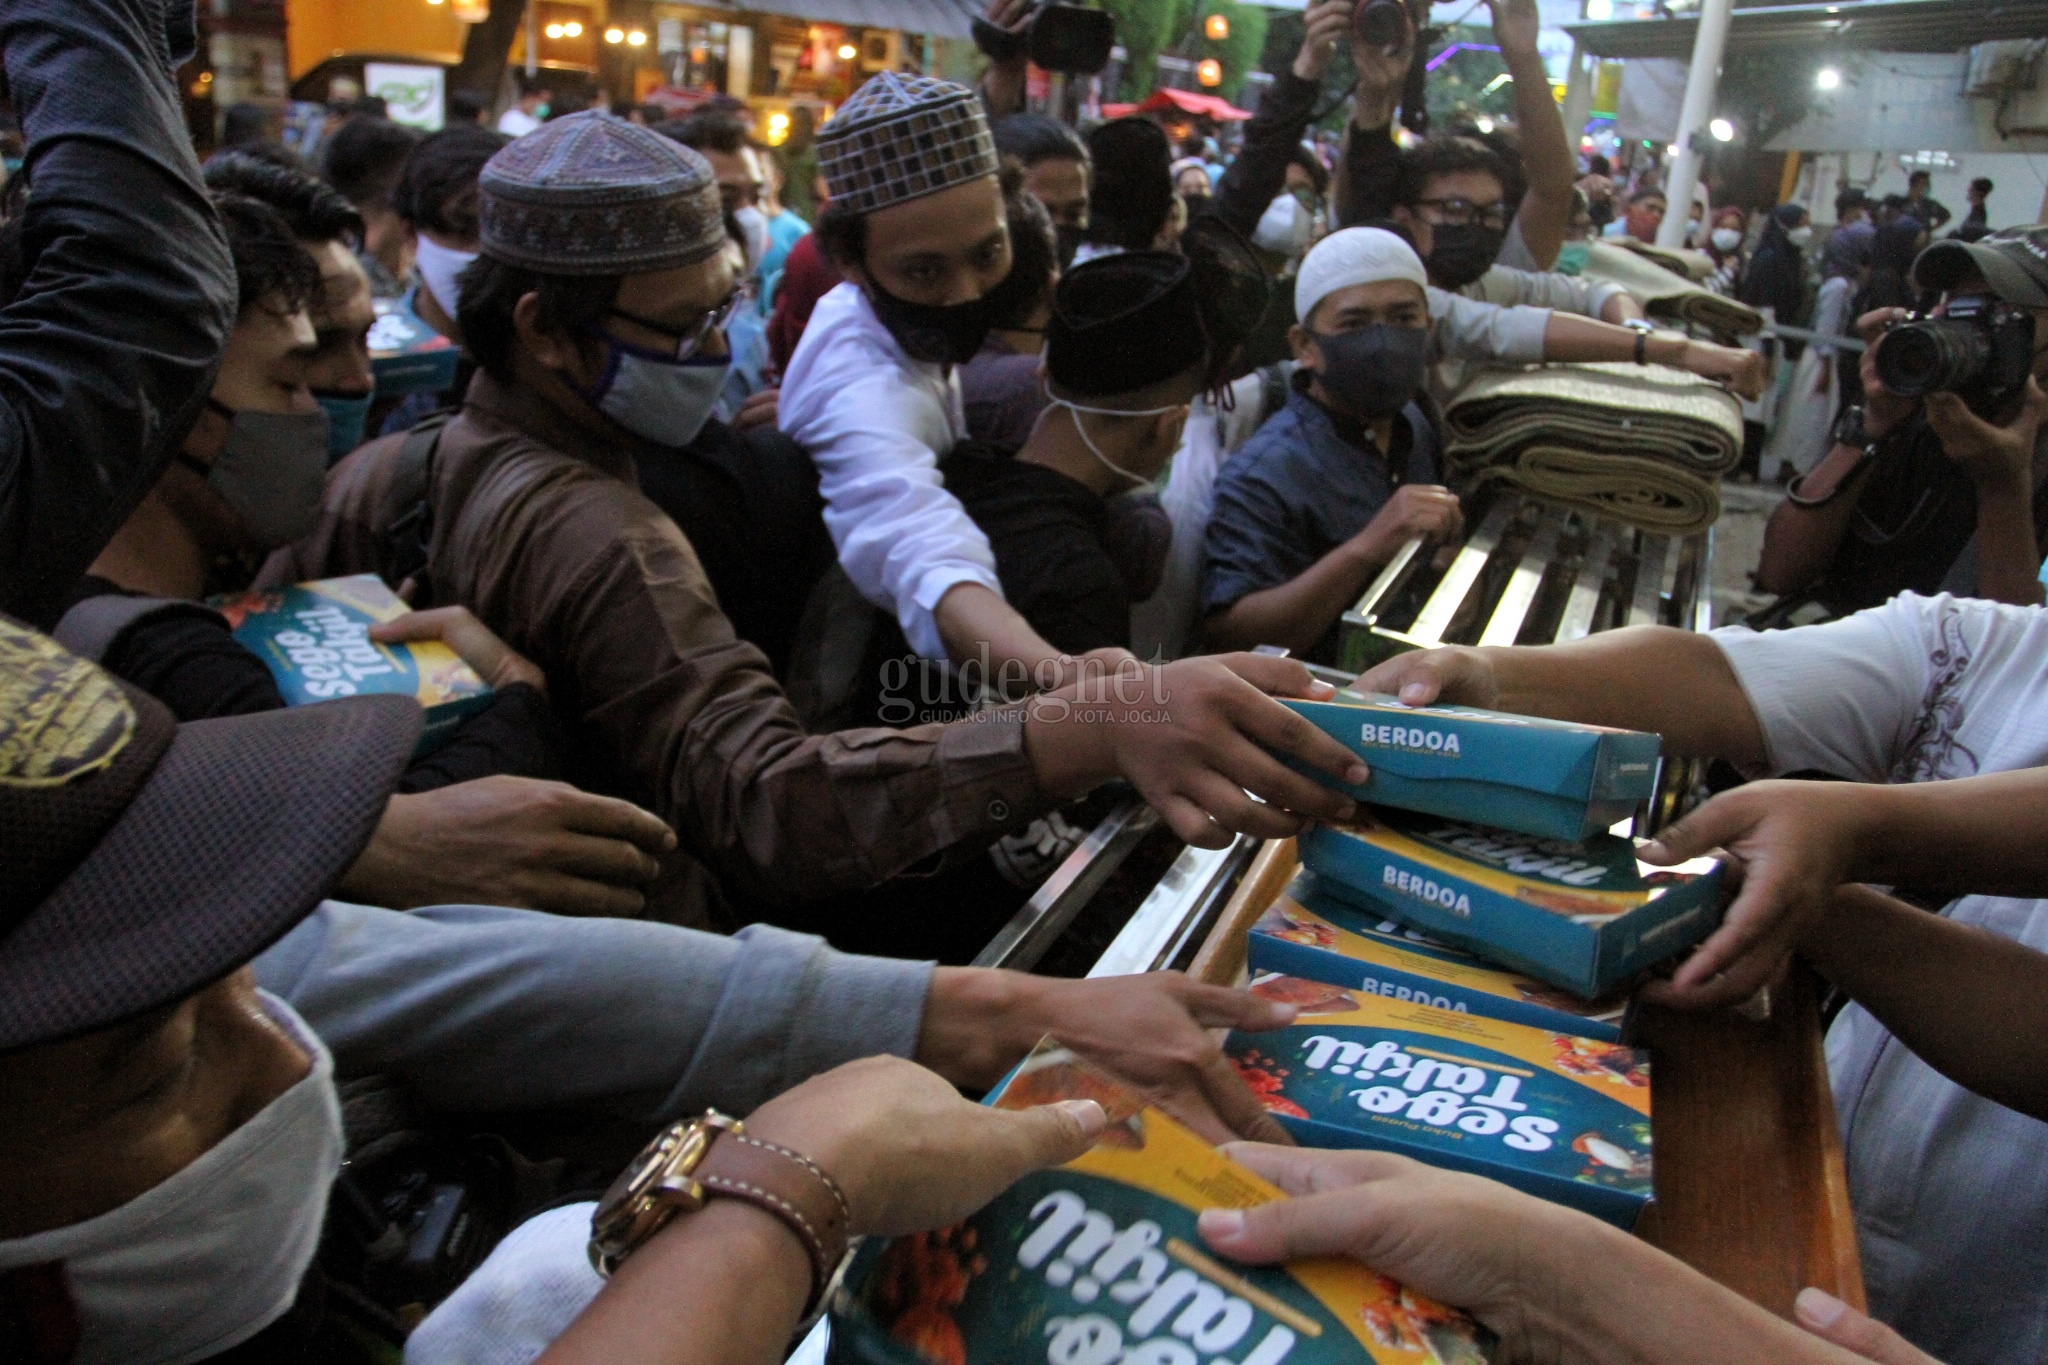 Ribuan Takjil Dibagikan, Masjid Jogokariyan Diserbu Warga